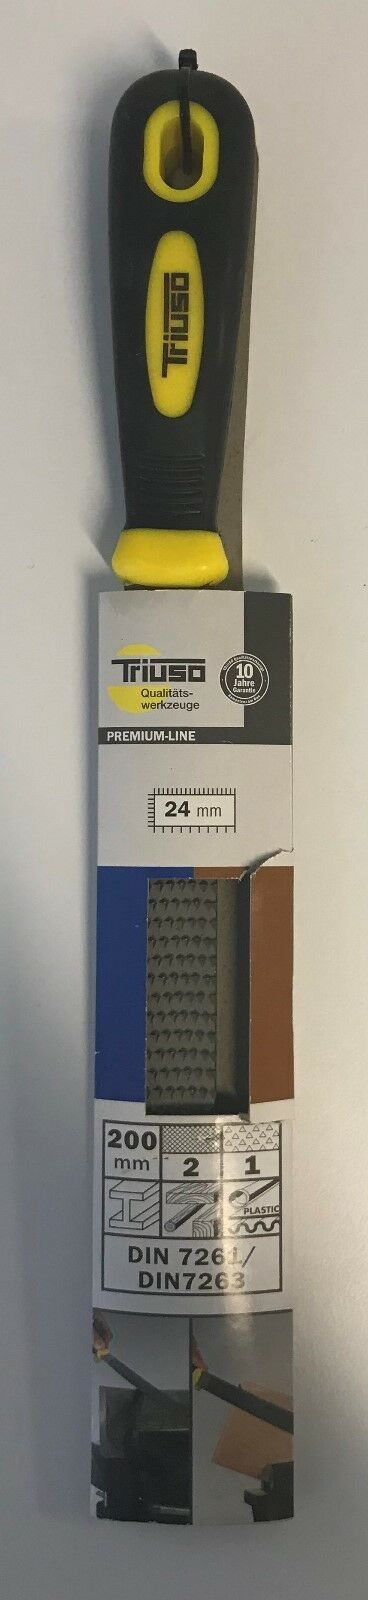 Kombi-Raspelfeile, flachstumpf - TRIUSO - F204, flachstumpf, 200 mm 1000-864-D